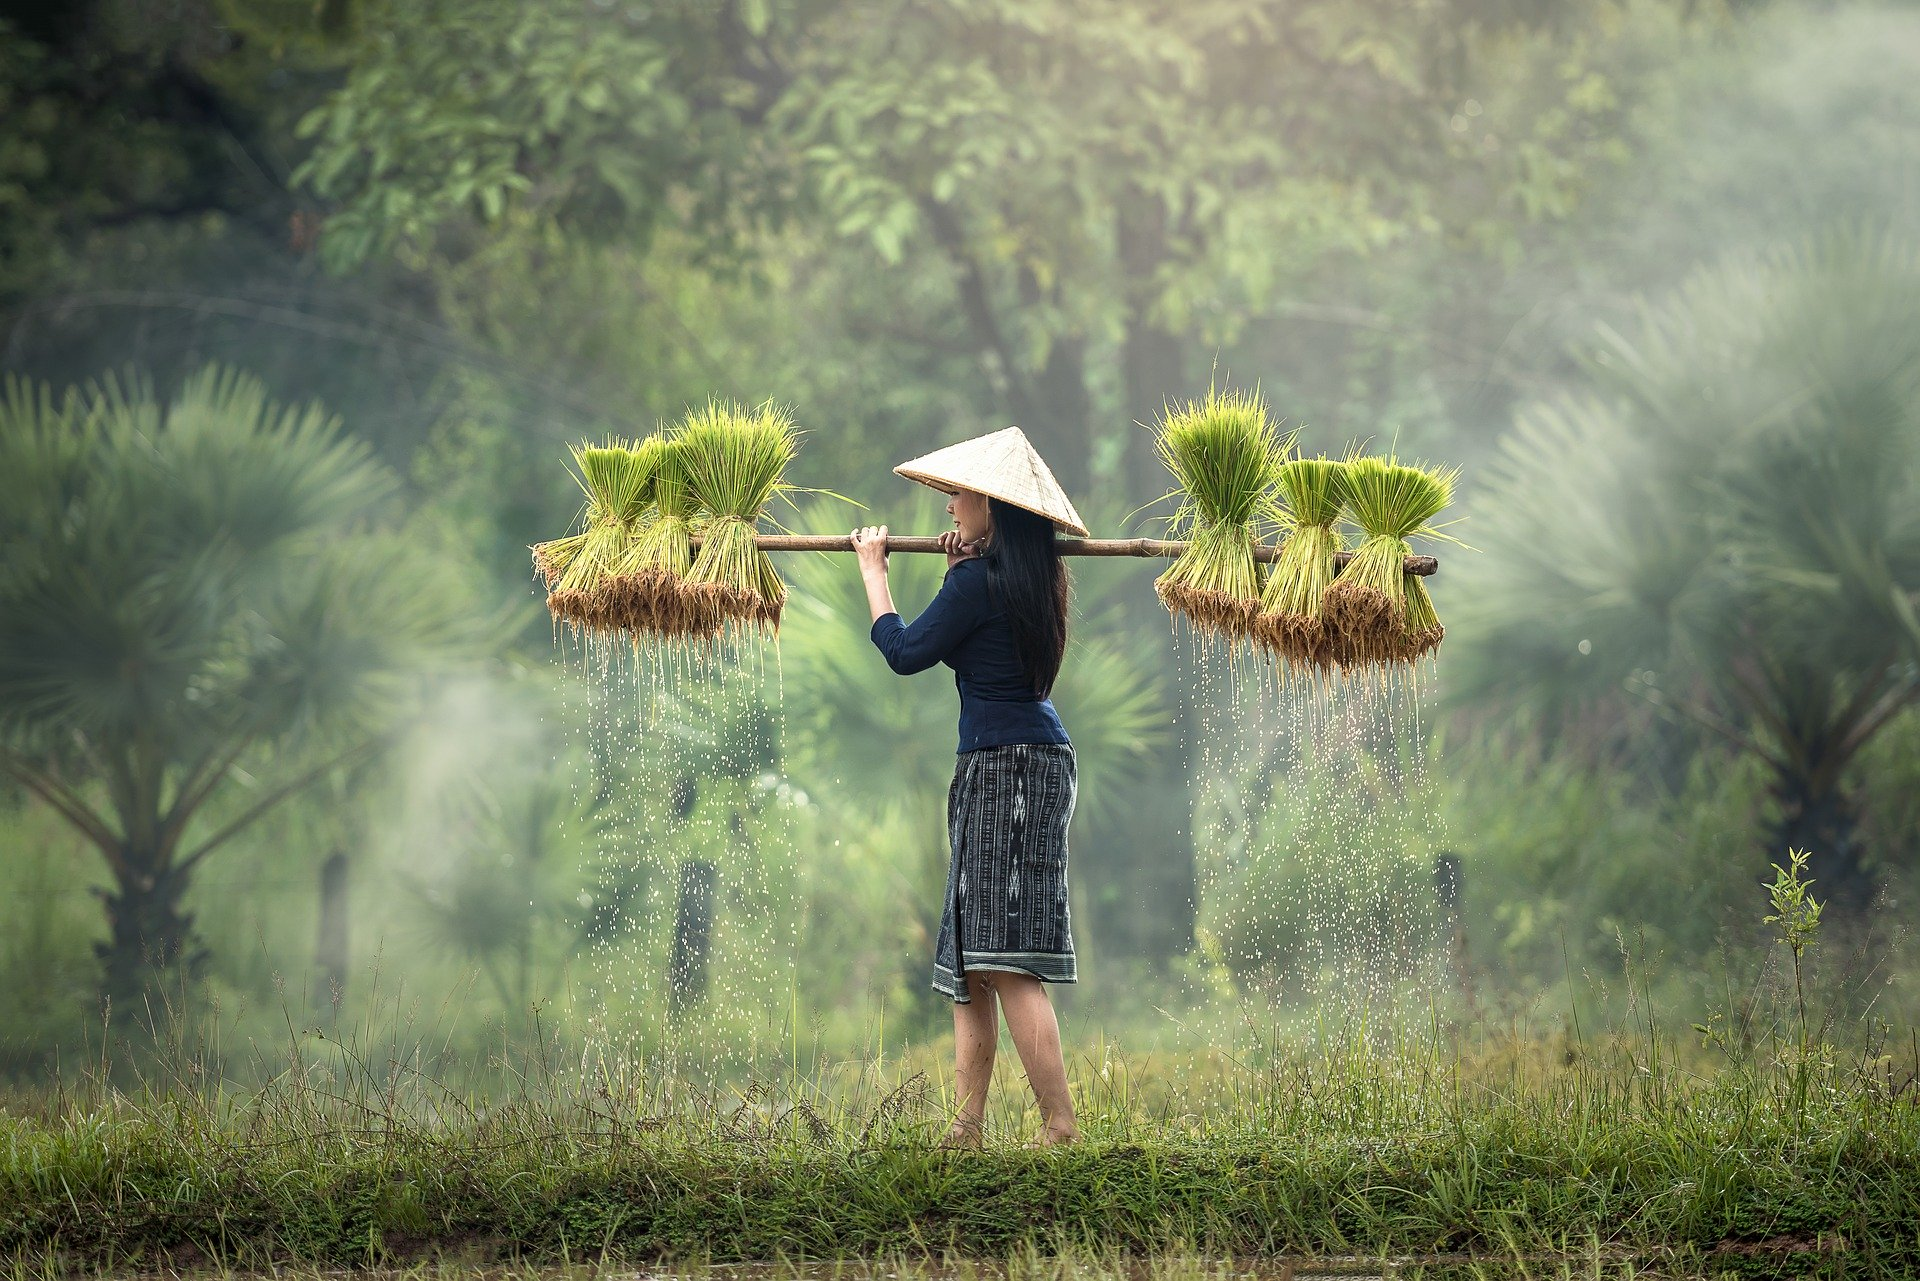 harvesting-1822578_1920